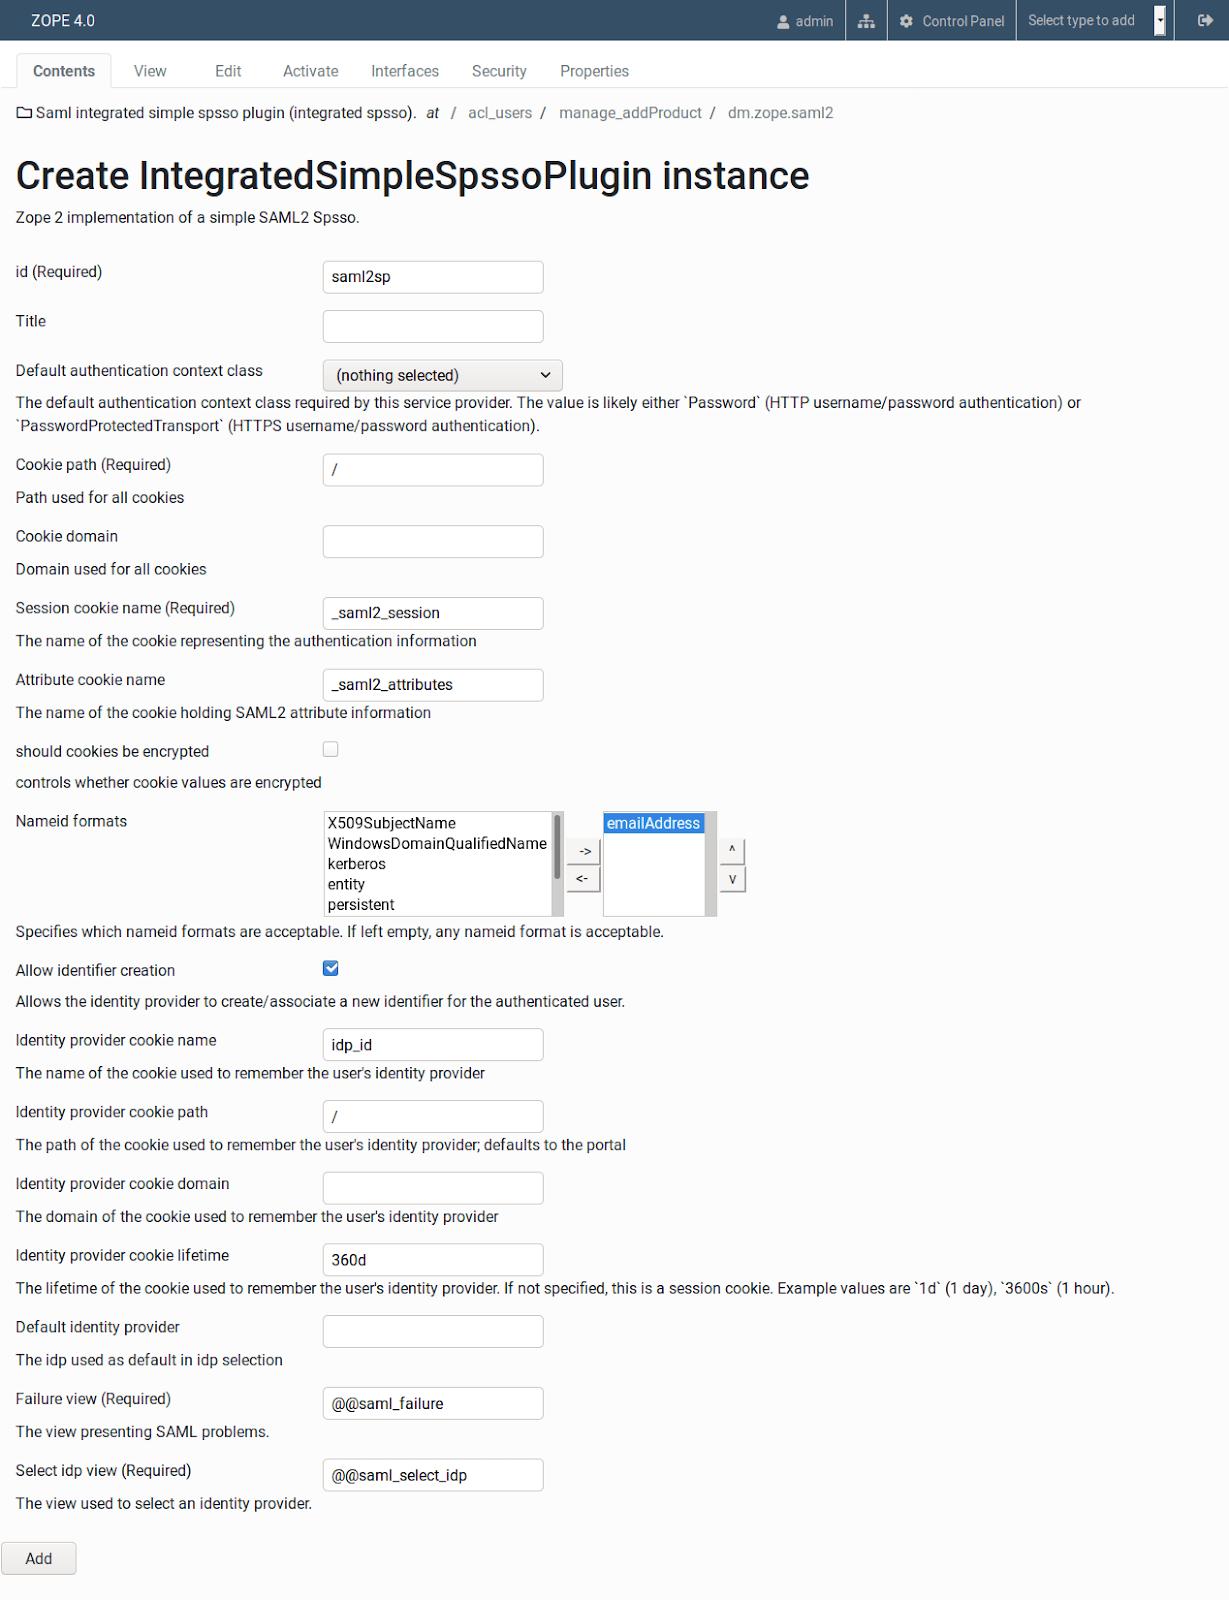 Saml integrated simple spsso plugin values